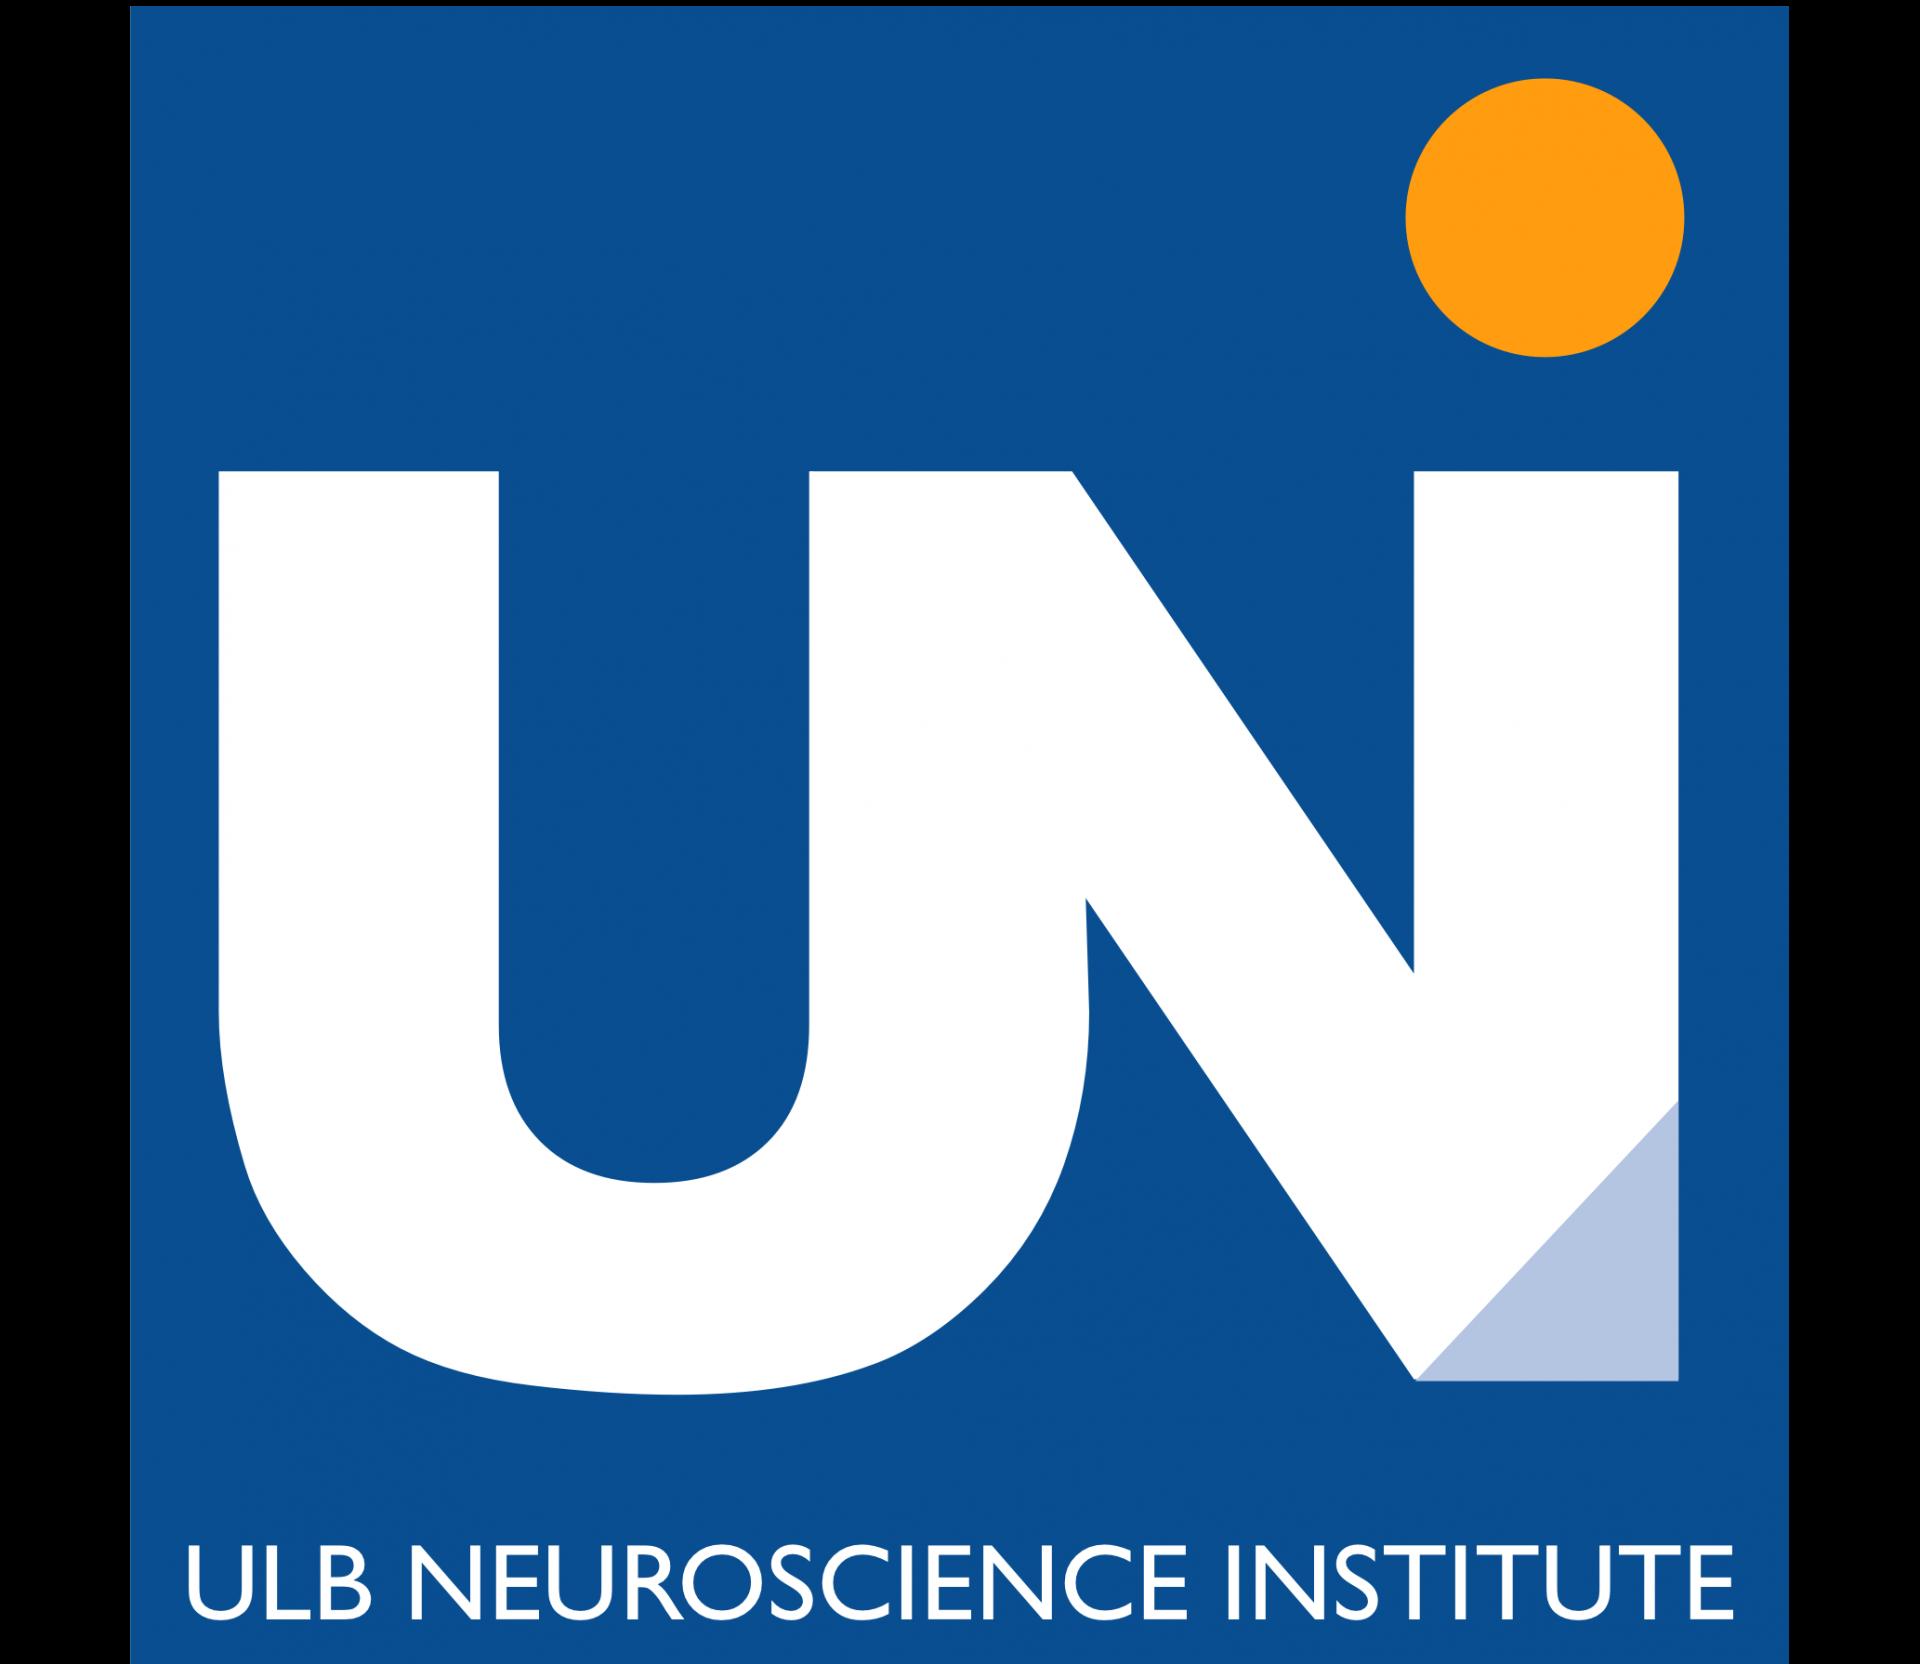 THE ULB NEUROSCIENCE INSTITUTE INTERNATIONAL Ph.D. PROGRAM IN NEUROSCIENCE 2017 CALL